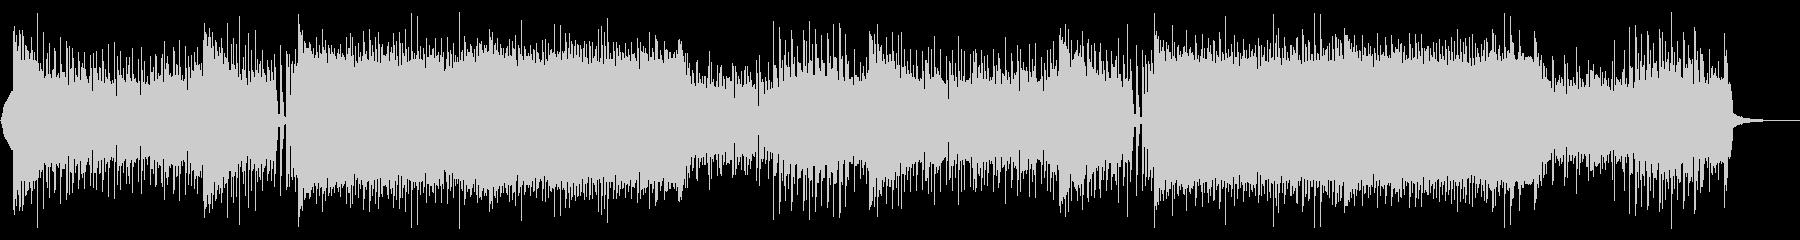 EDM アグレッシブ・盛り上がるの未再生の波形